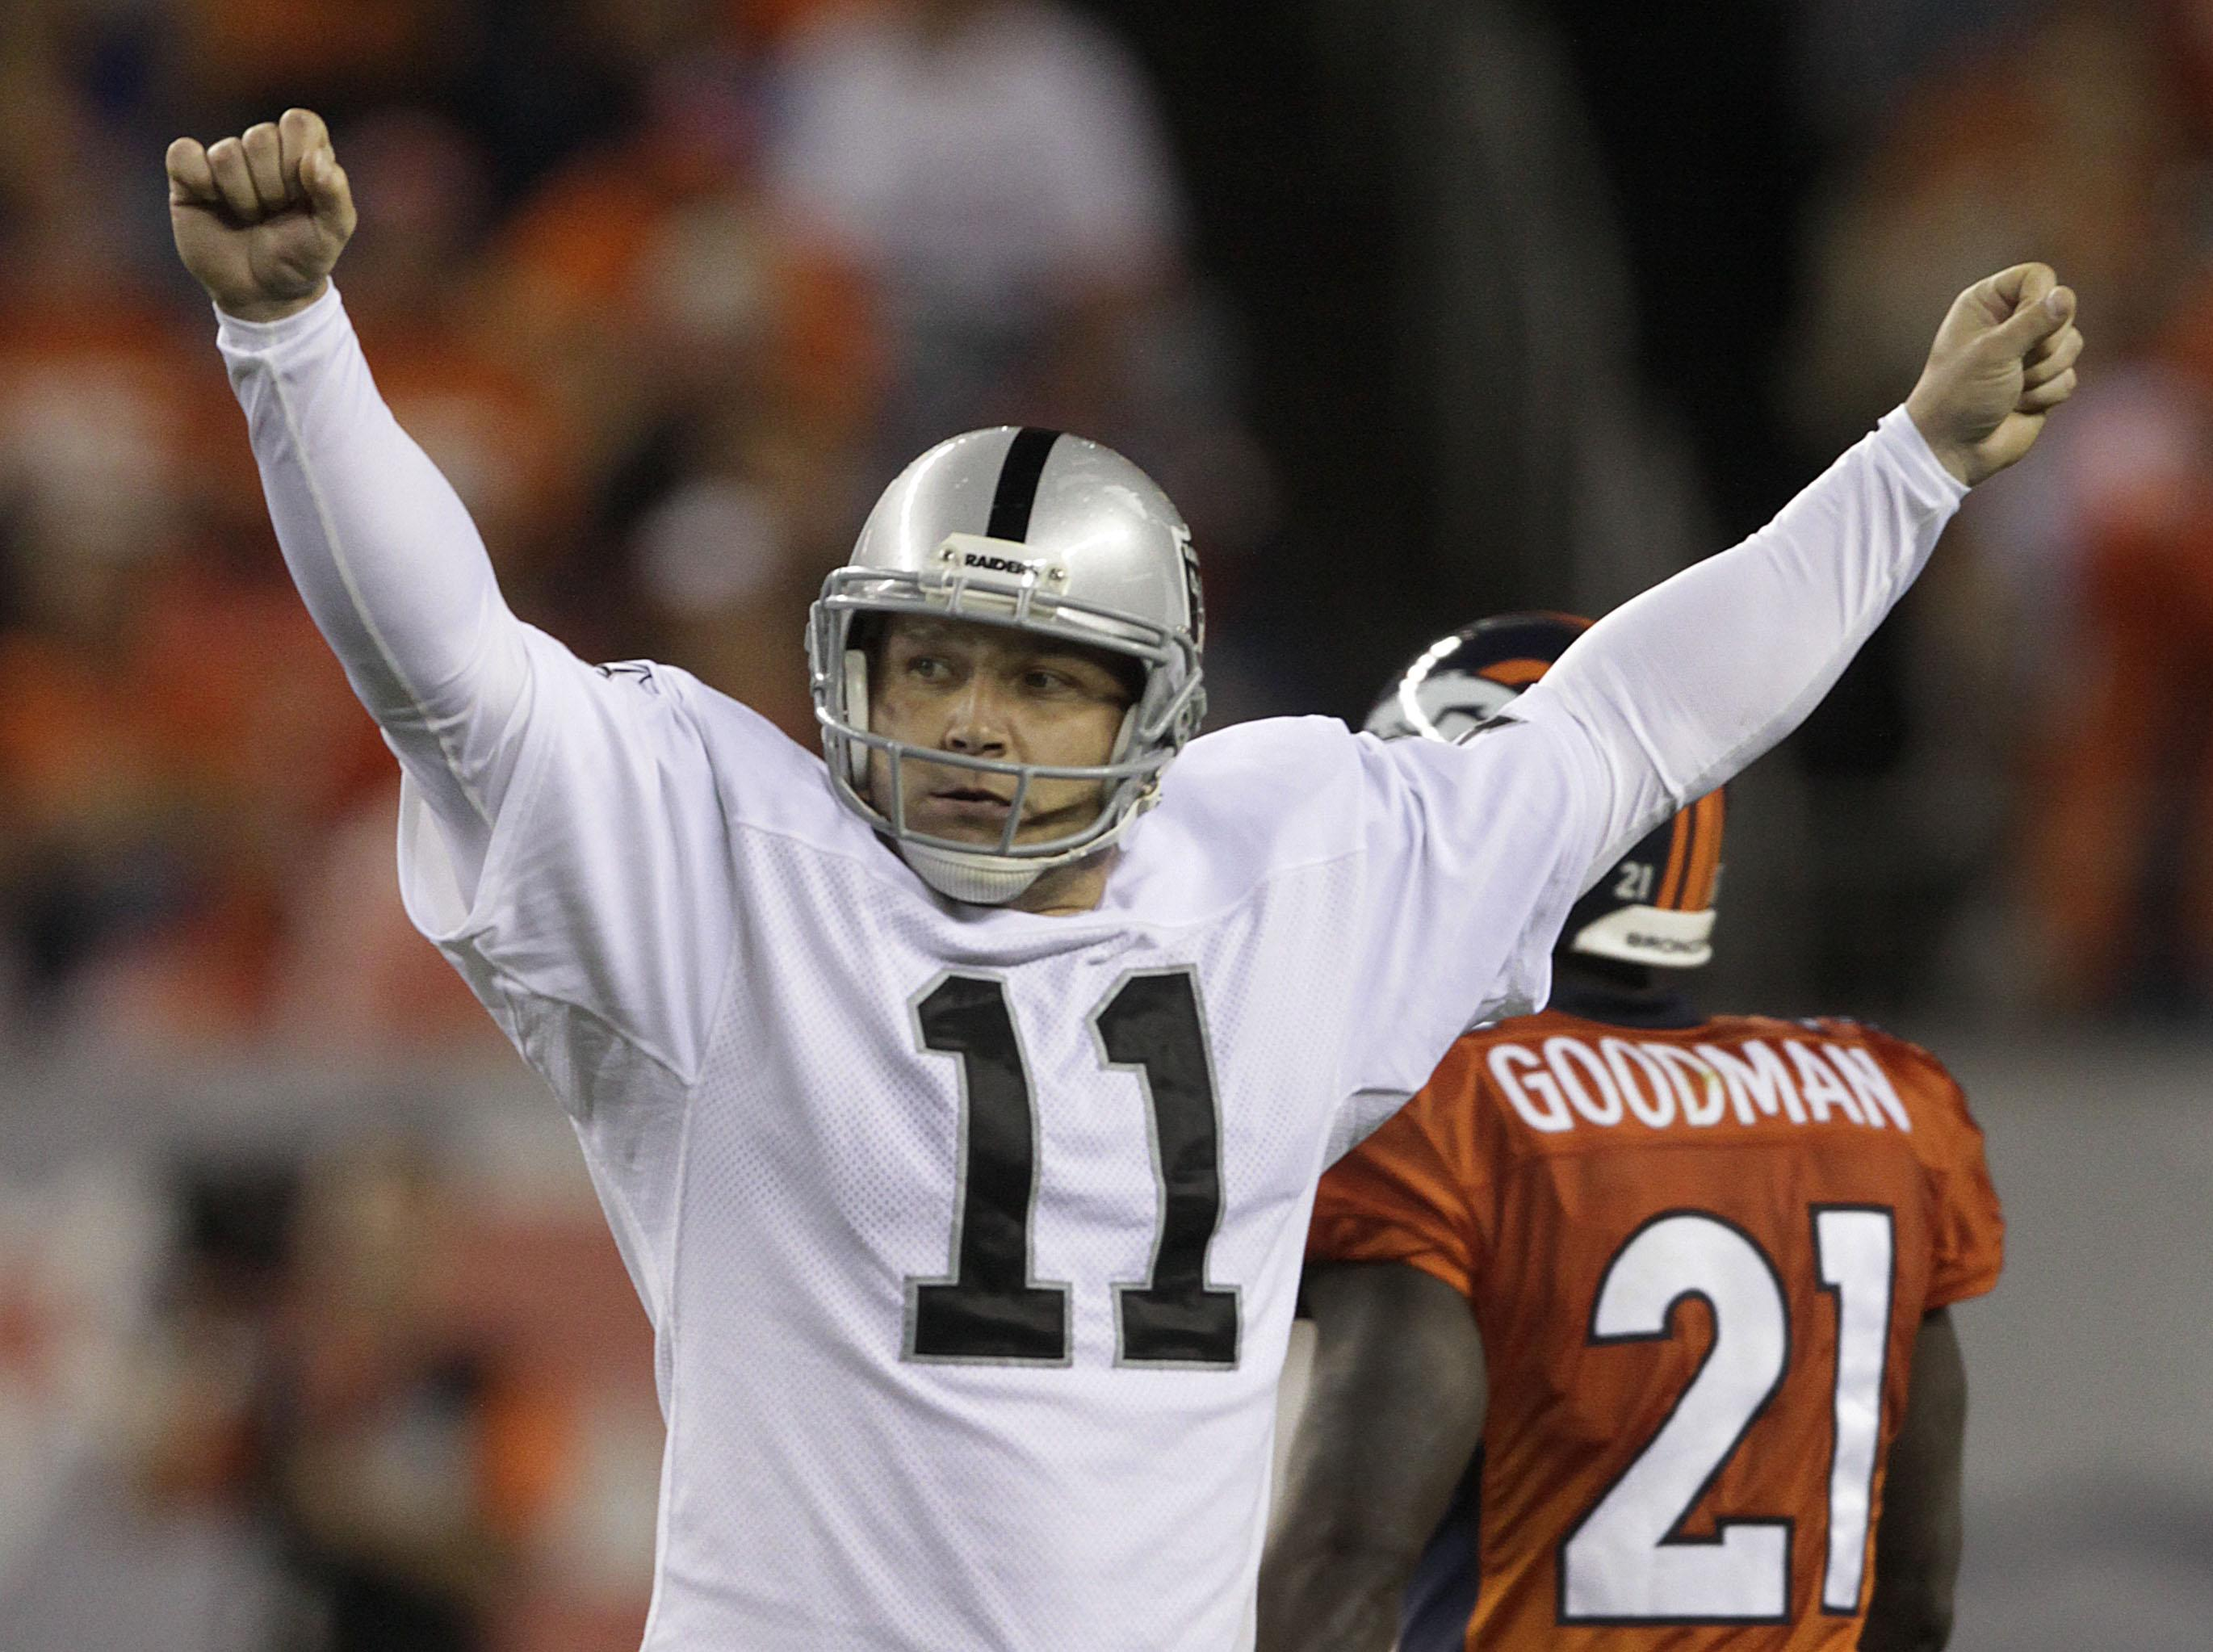 Ex-Raiders, Seahawks kicker Sebastian Janikowski retiring after 18 seasons